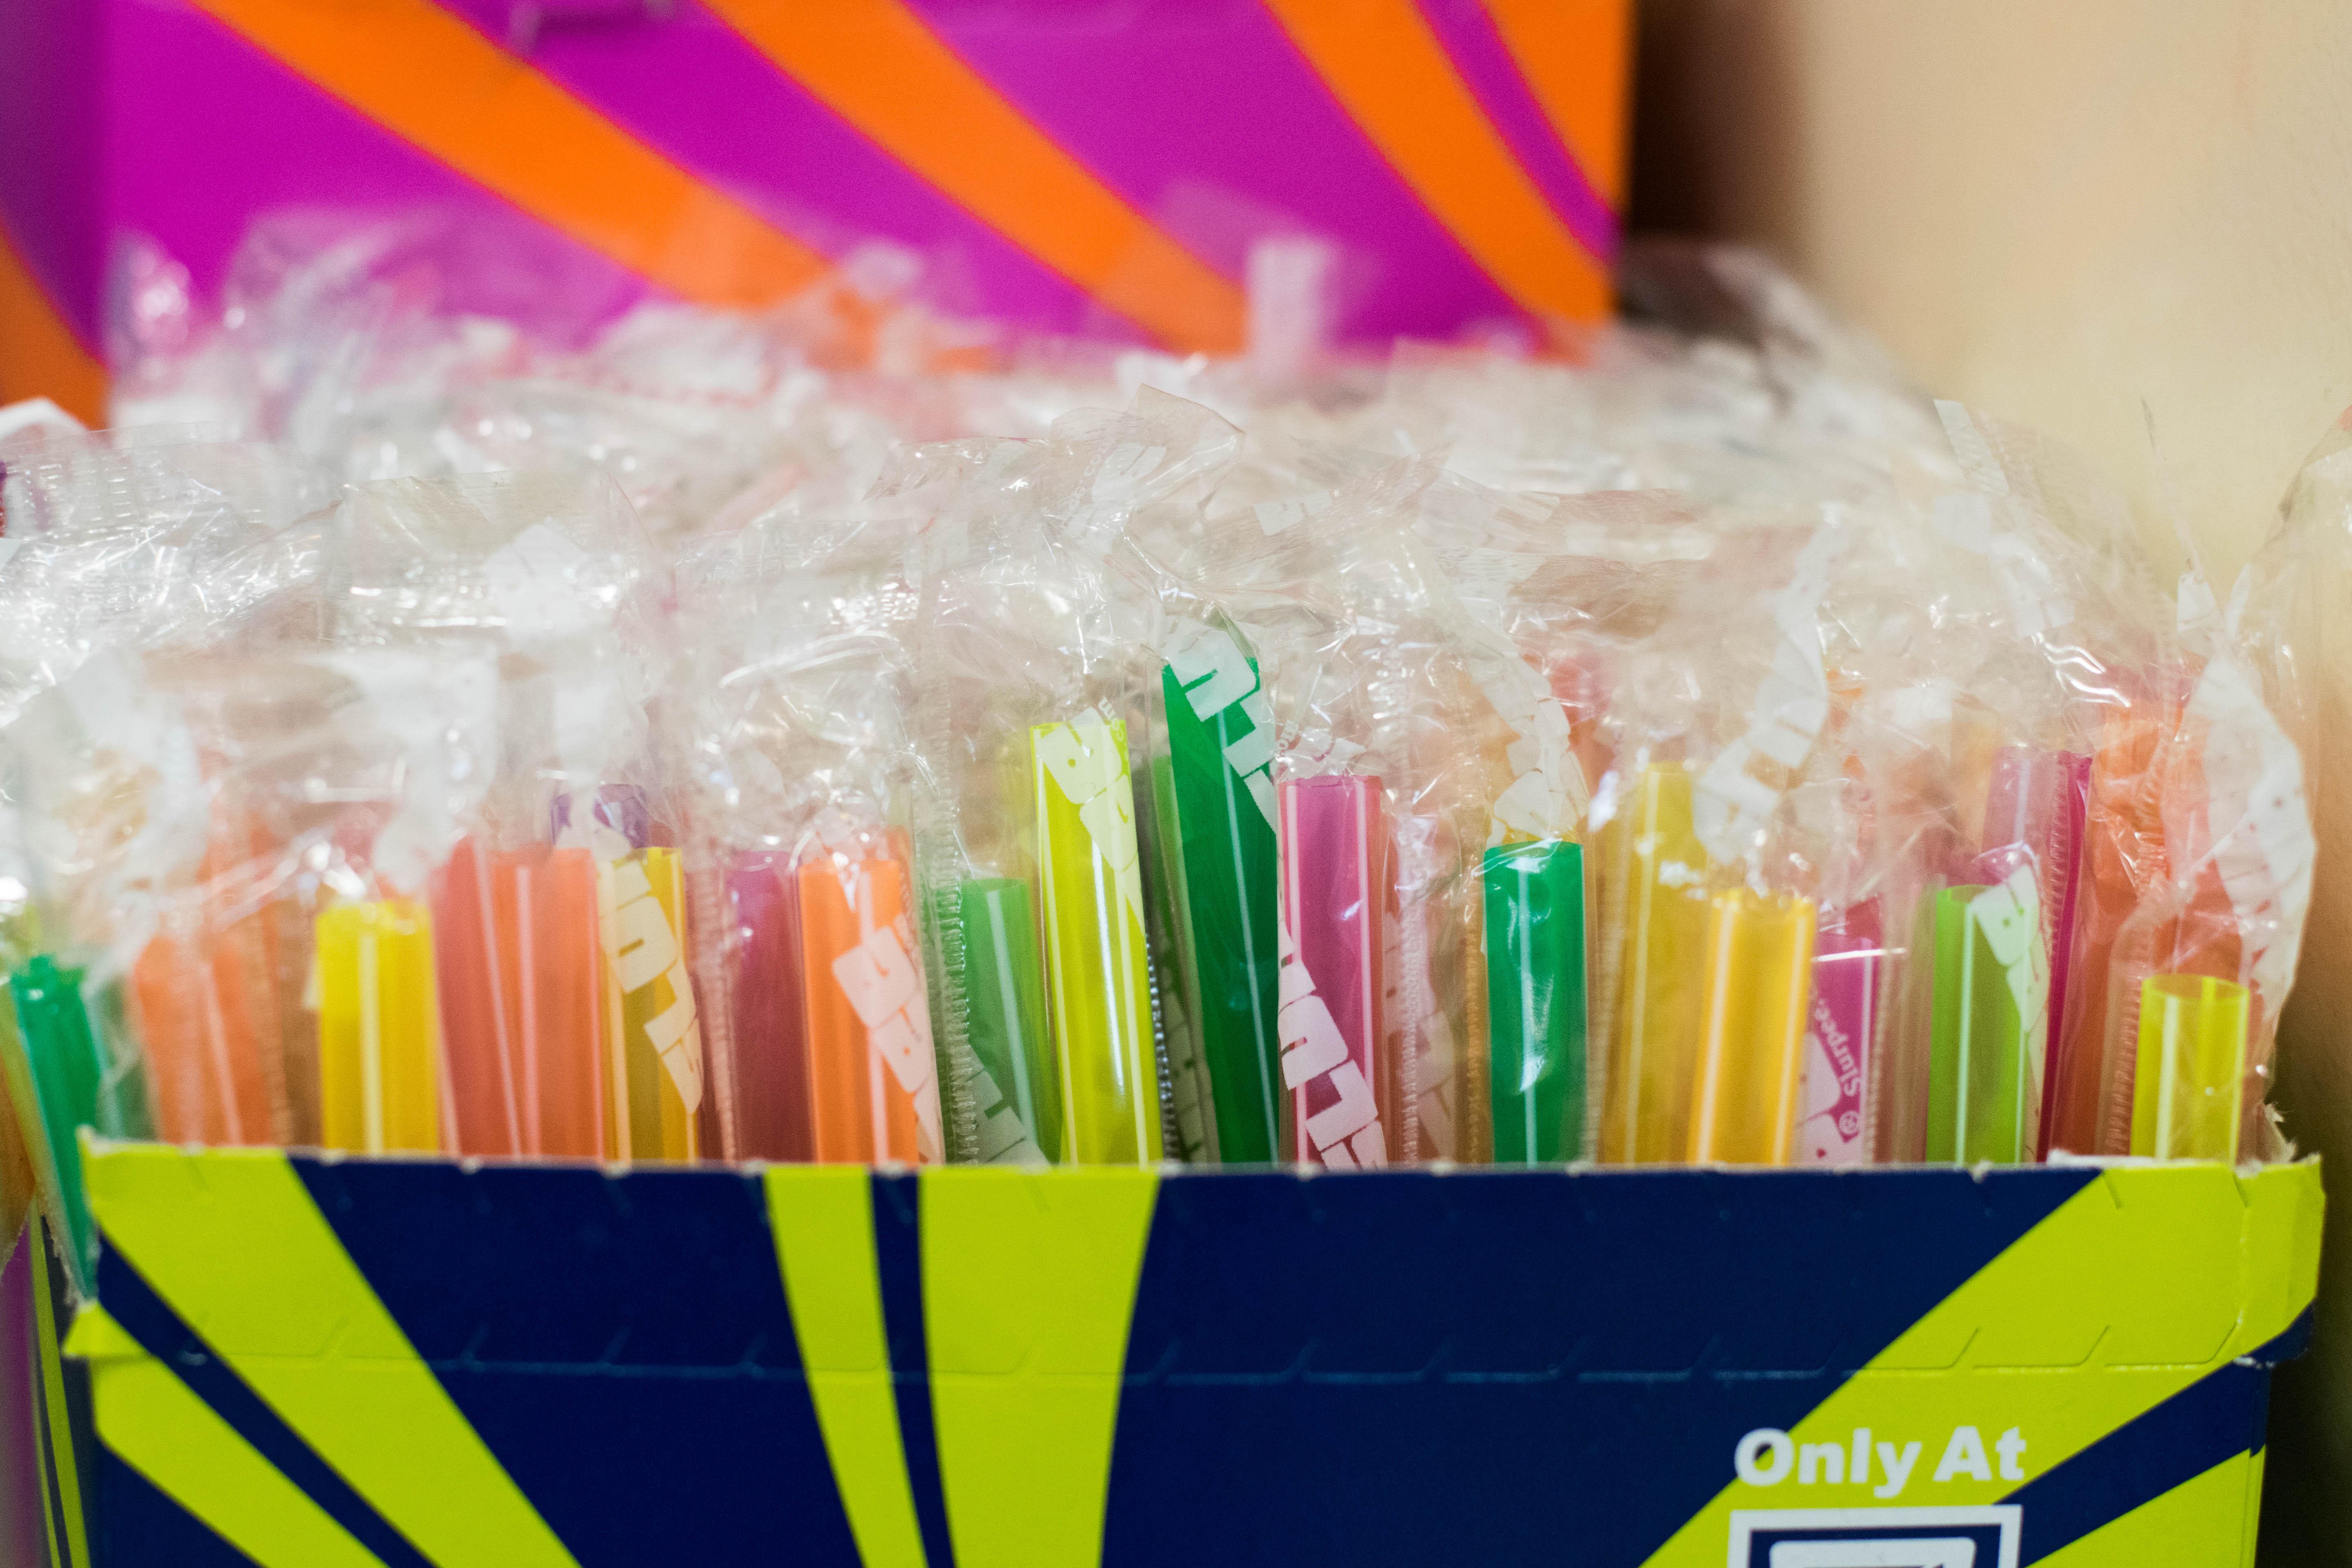 Straws photo